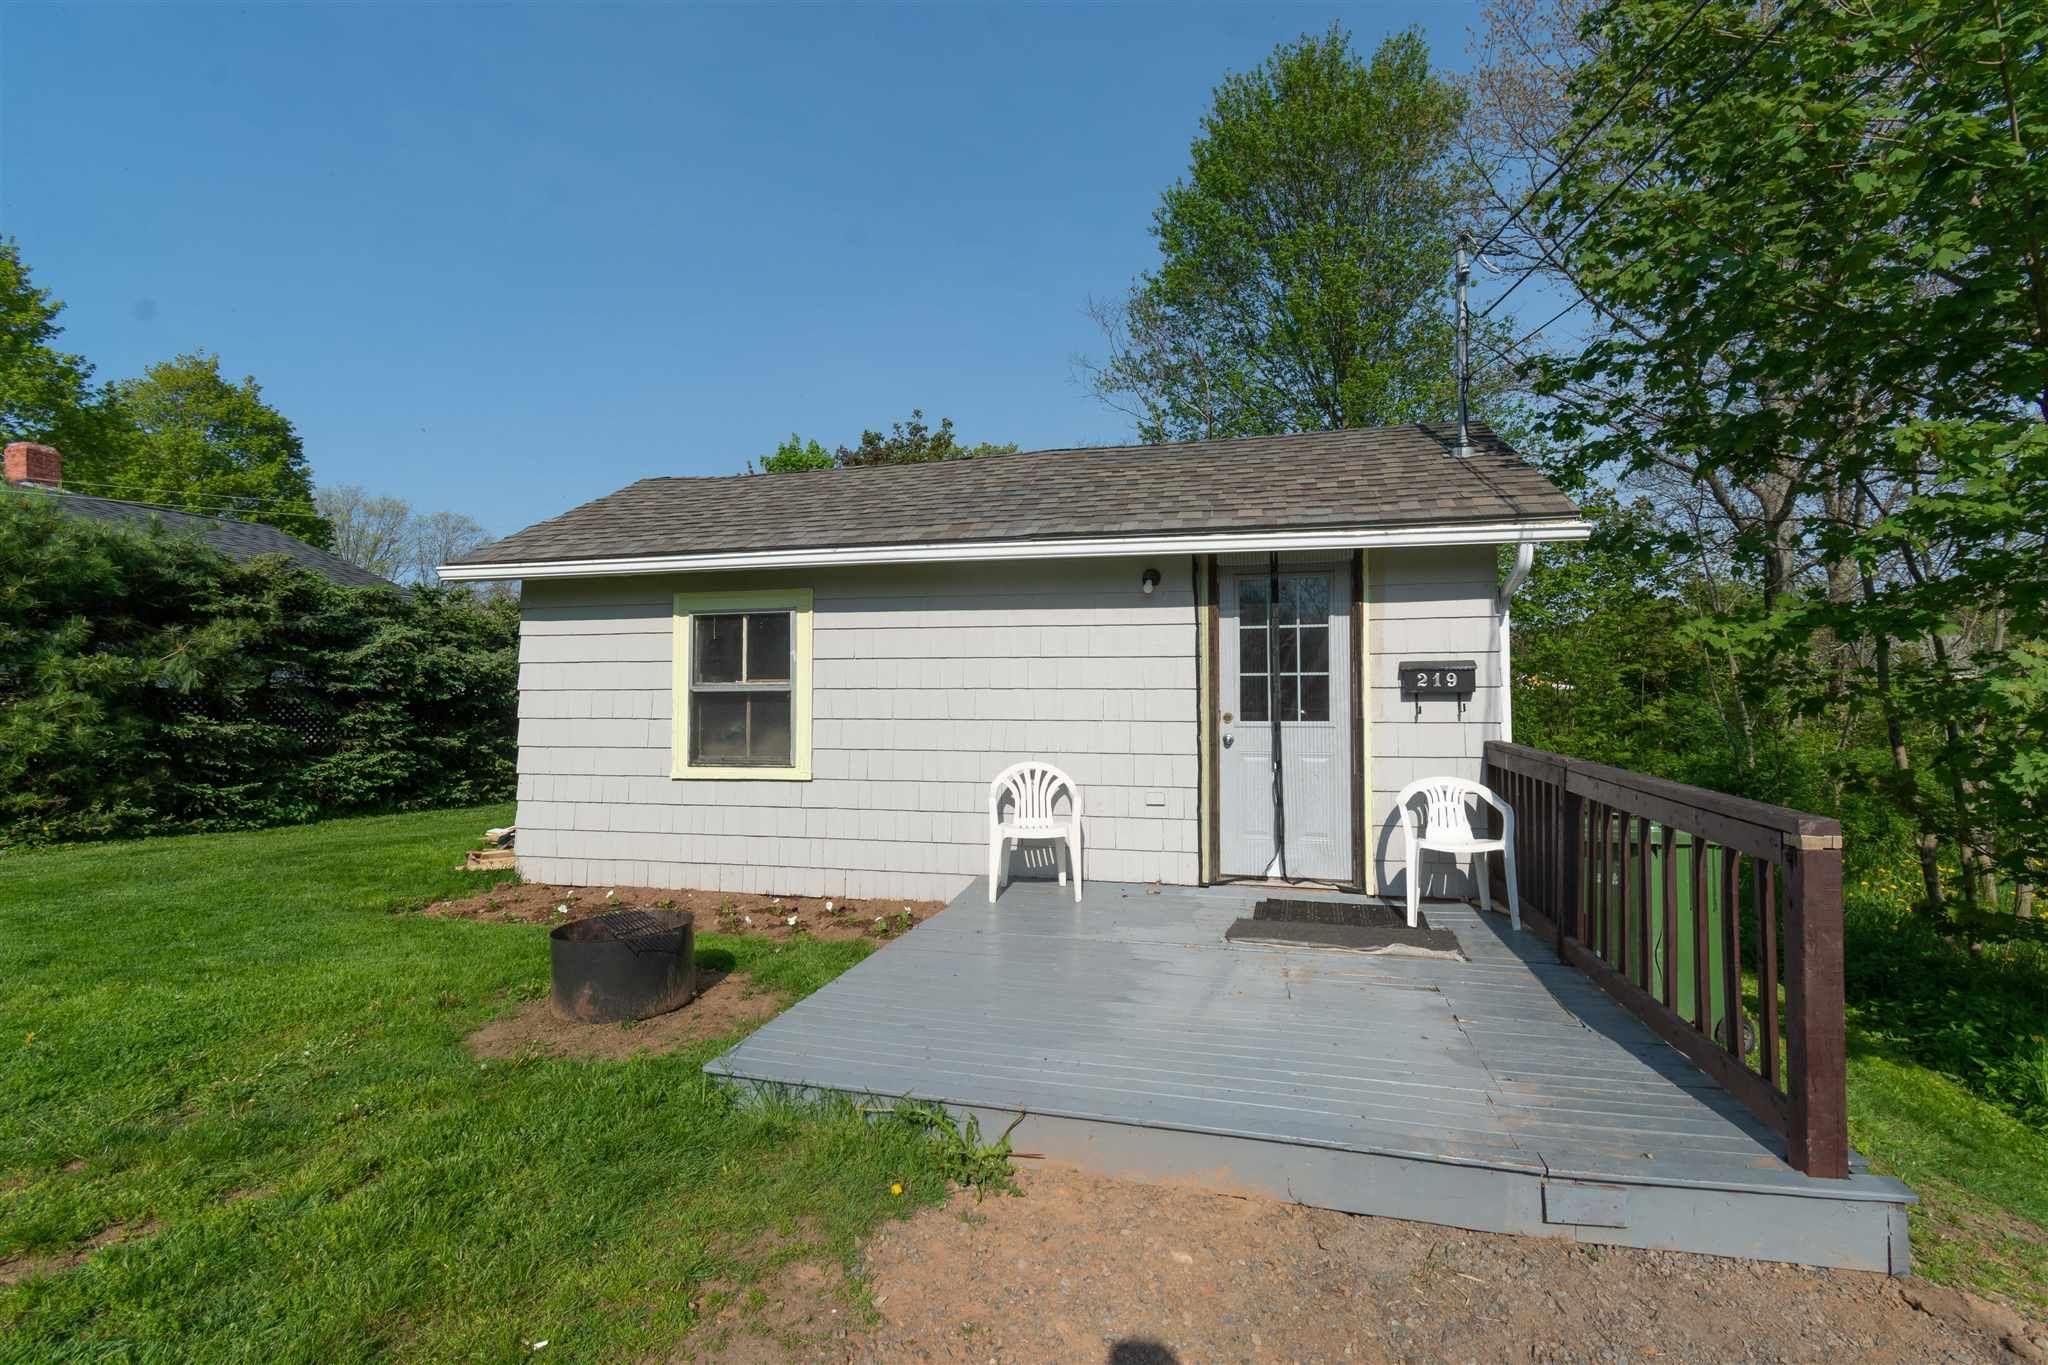 Main Photo: 219-221 Oakdene Avenue in Kentville: 404-Kings County Multi-Family for sale (Annapolis Valley)  : MLS®# 202112720